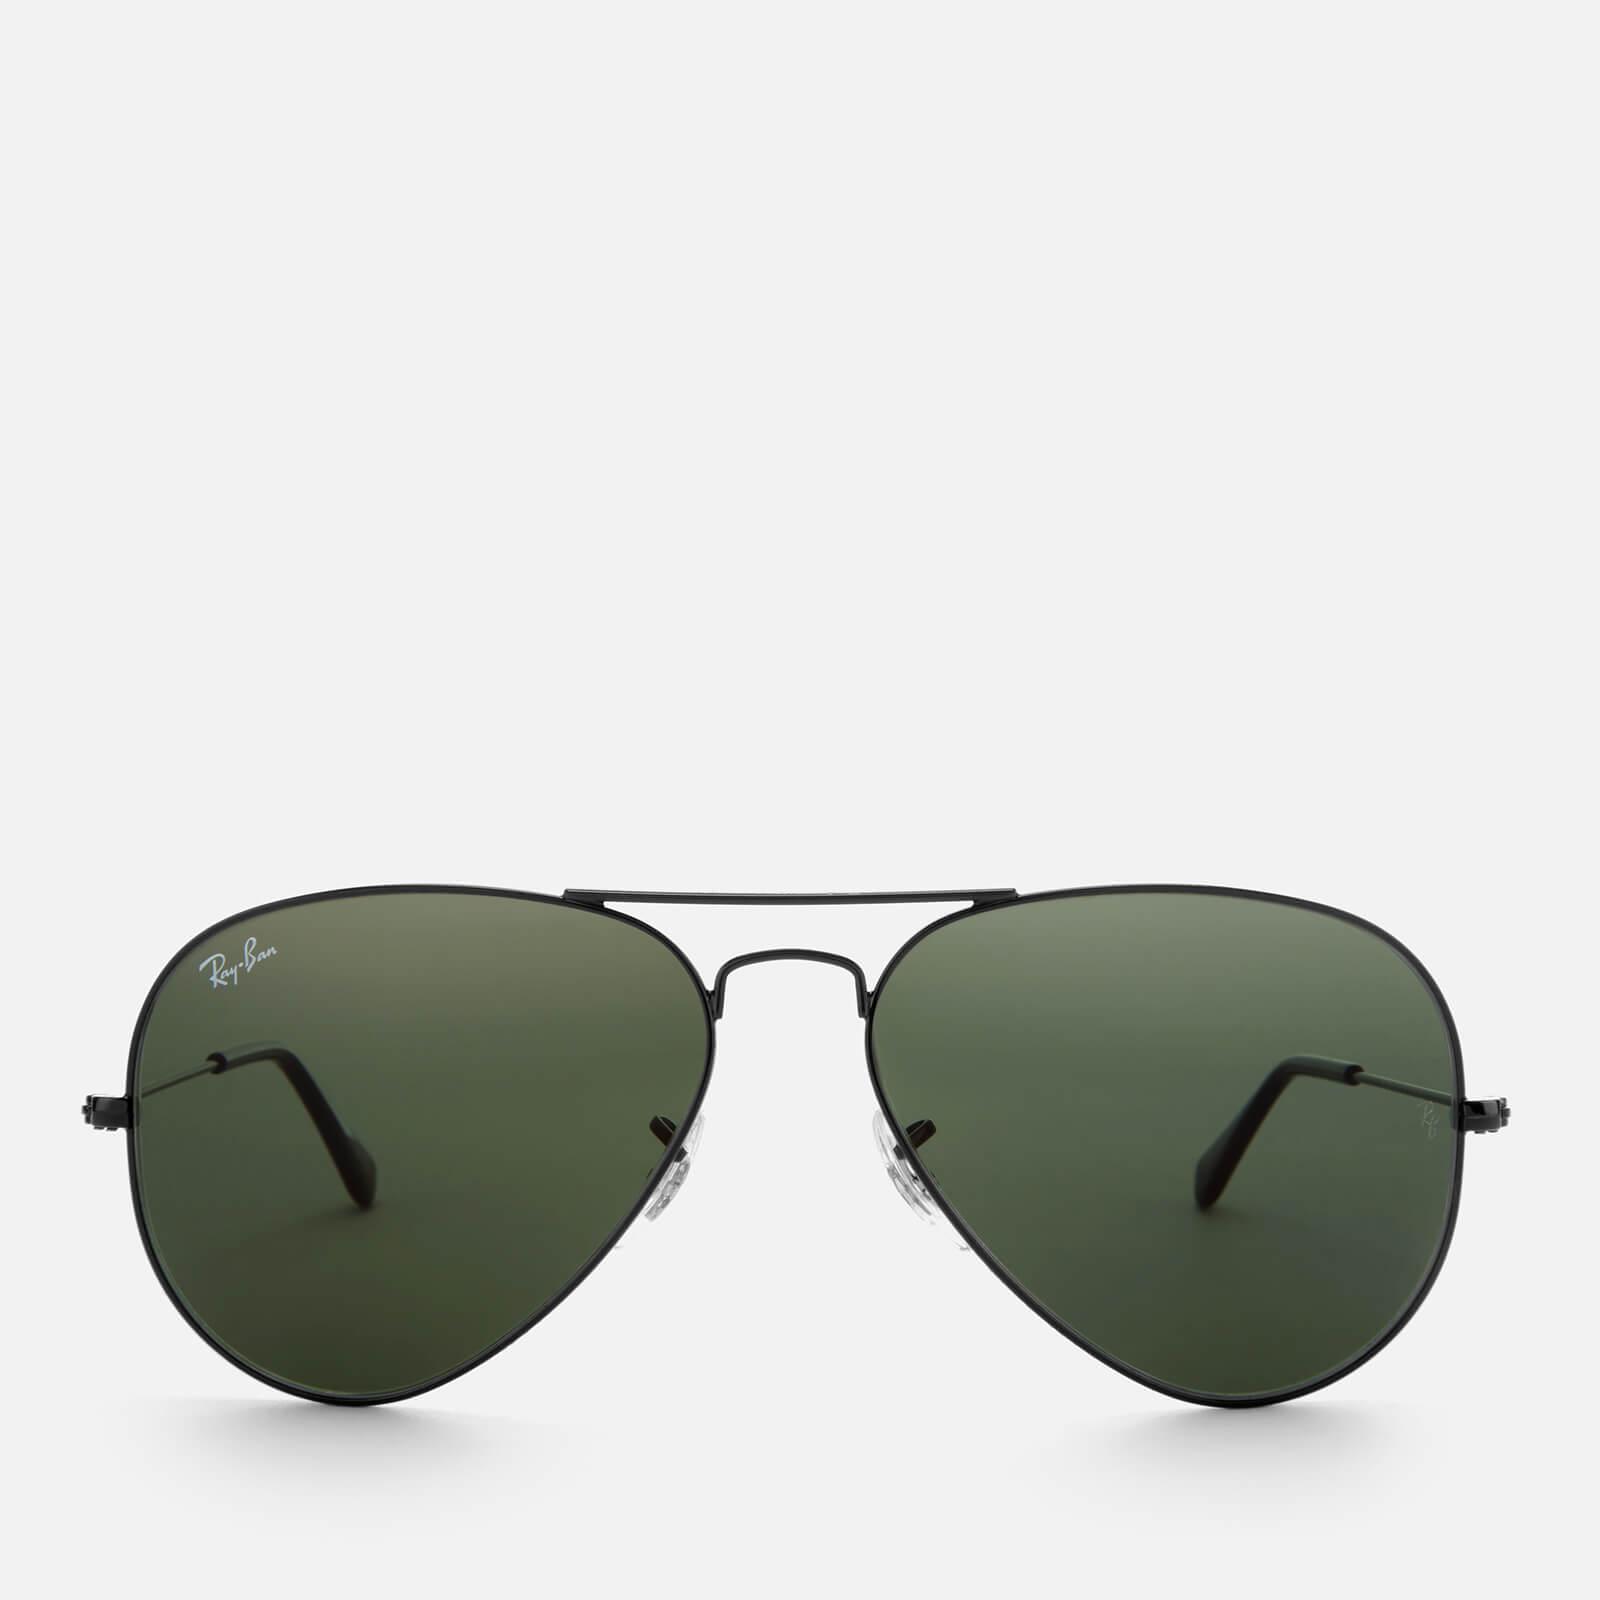 Ray Ban Men S Aviator Metal Frame Sunglasses Black